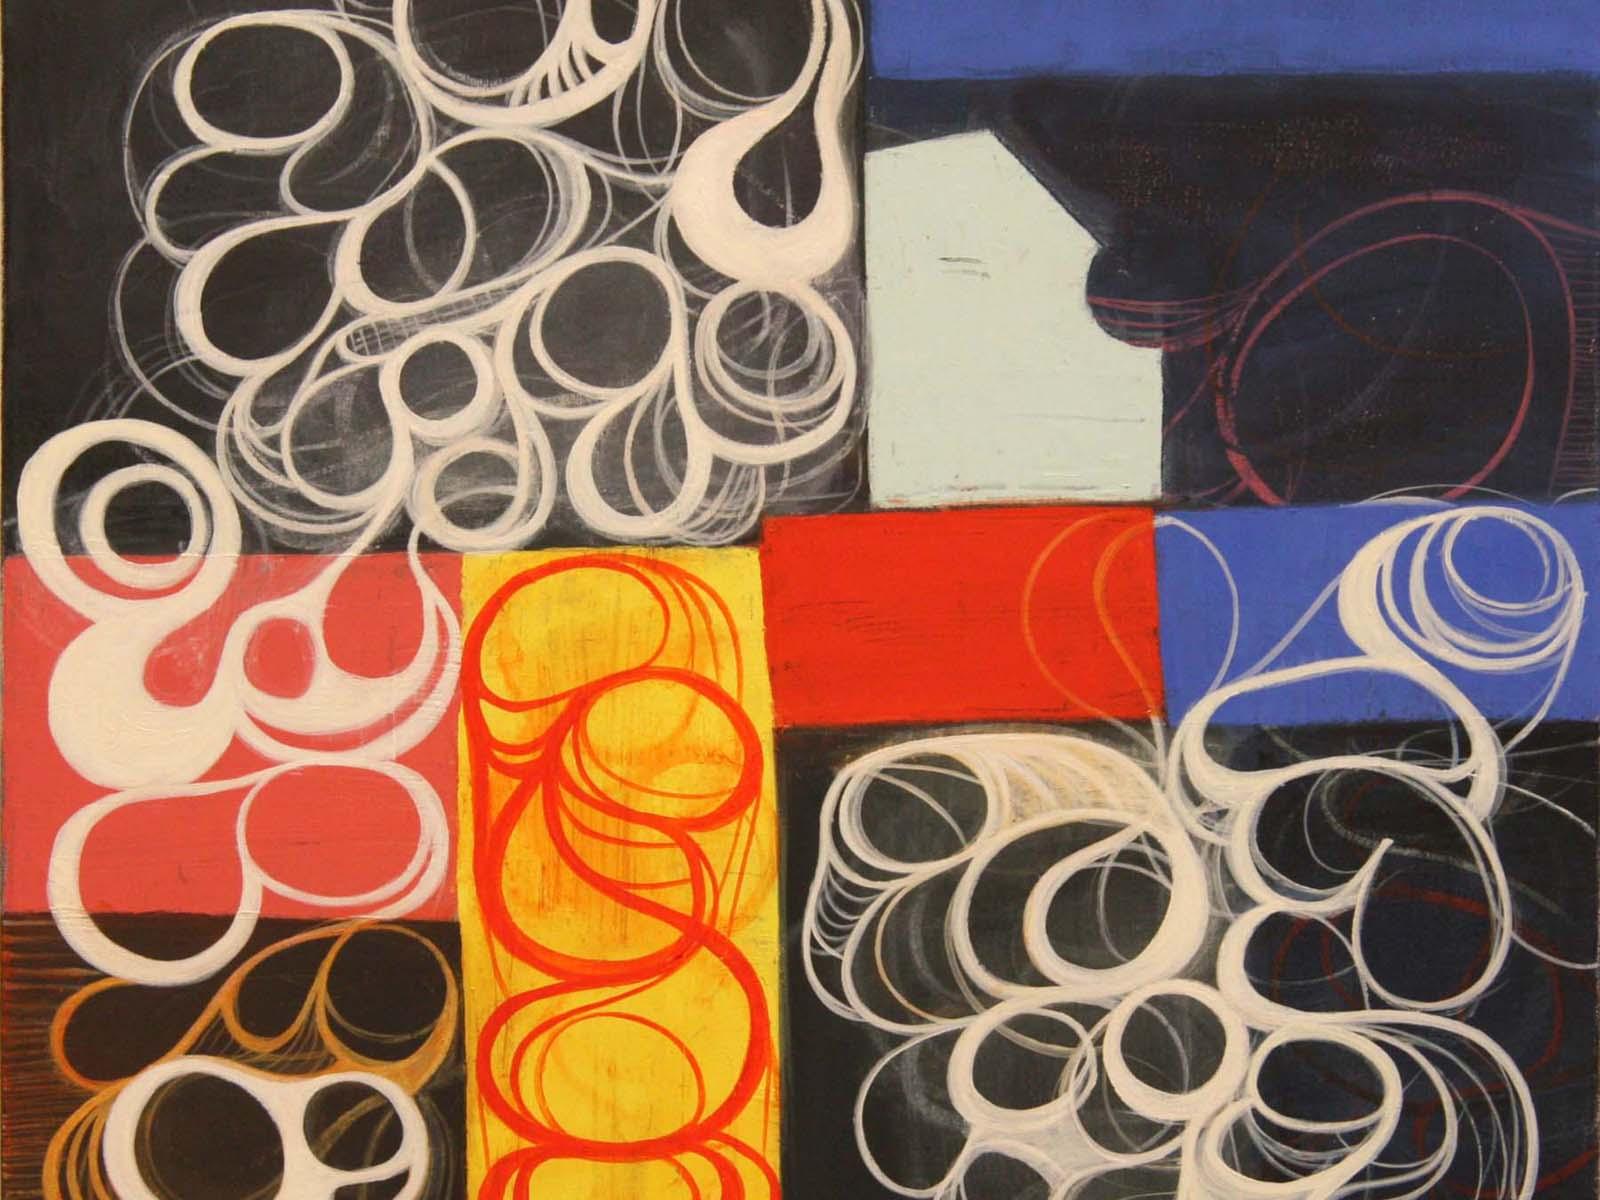 Irene Lipton, untitled, 2012 Recipient